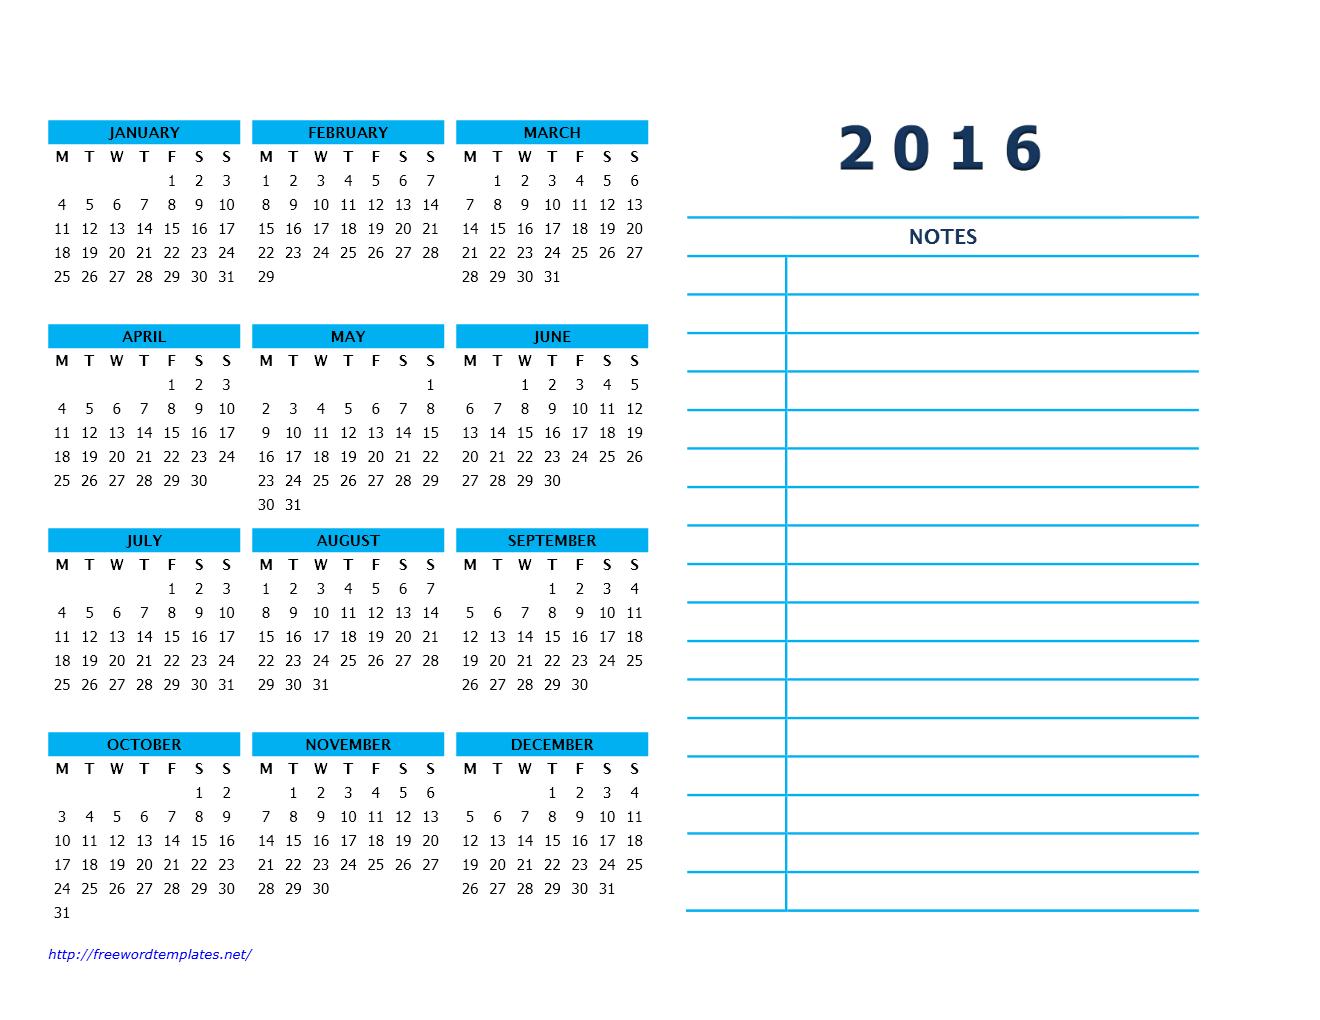 2016 Calendar Templates | Freewordtemplates.net